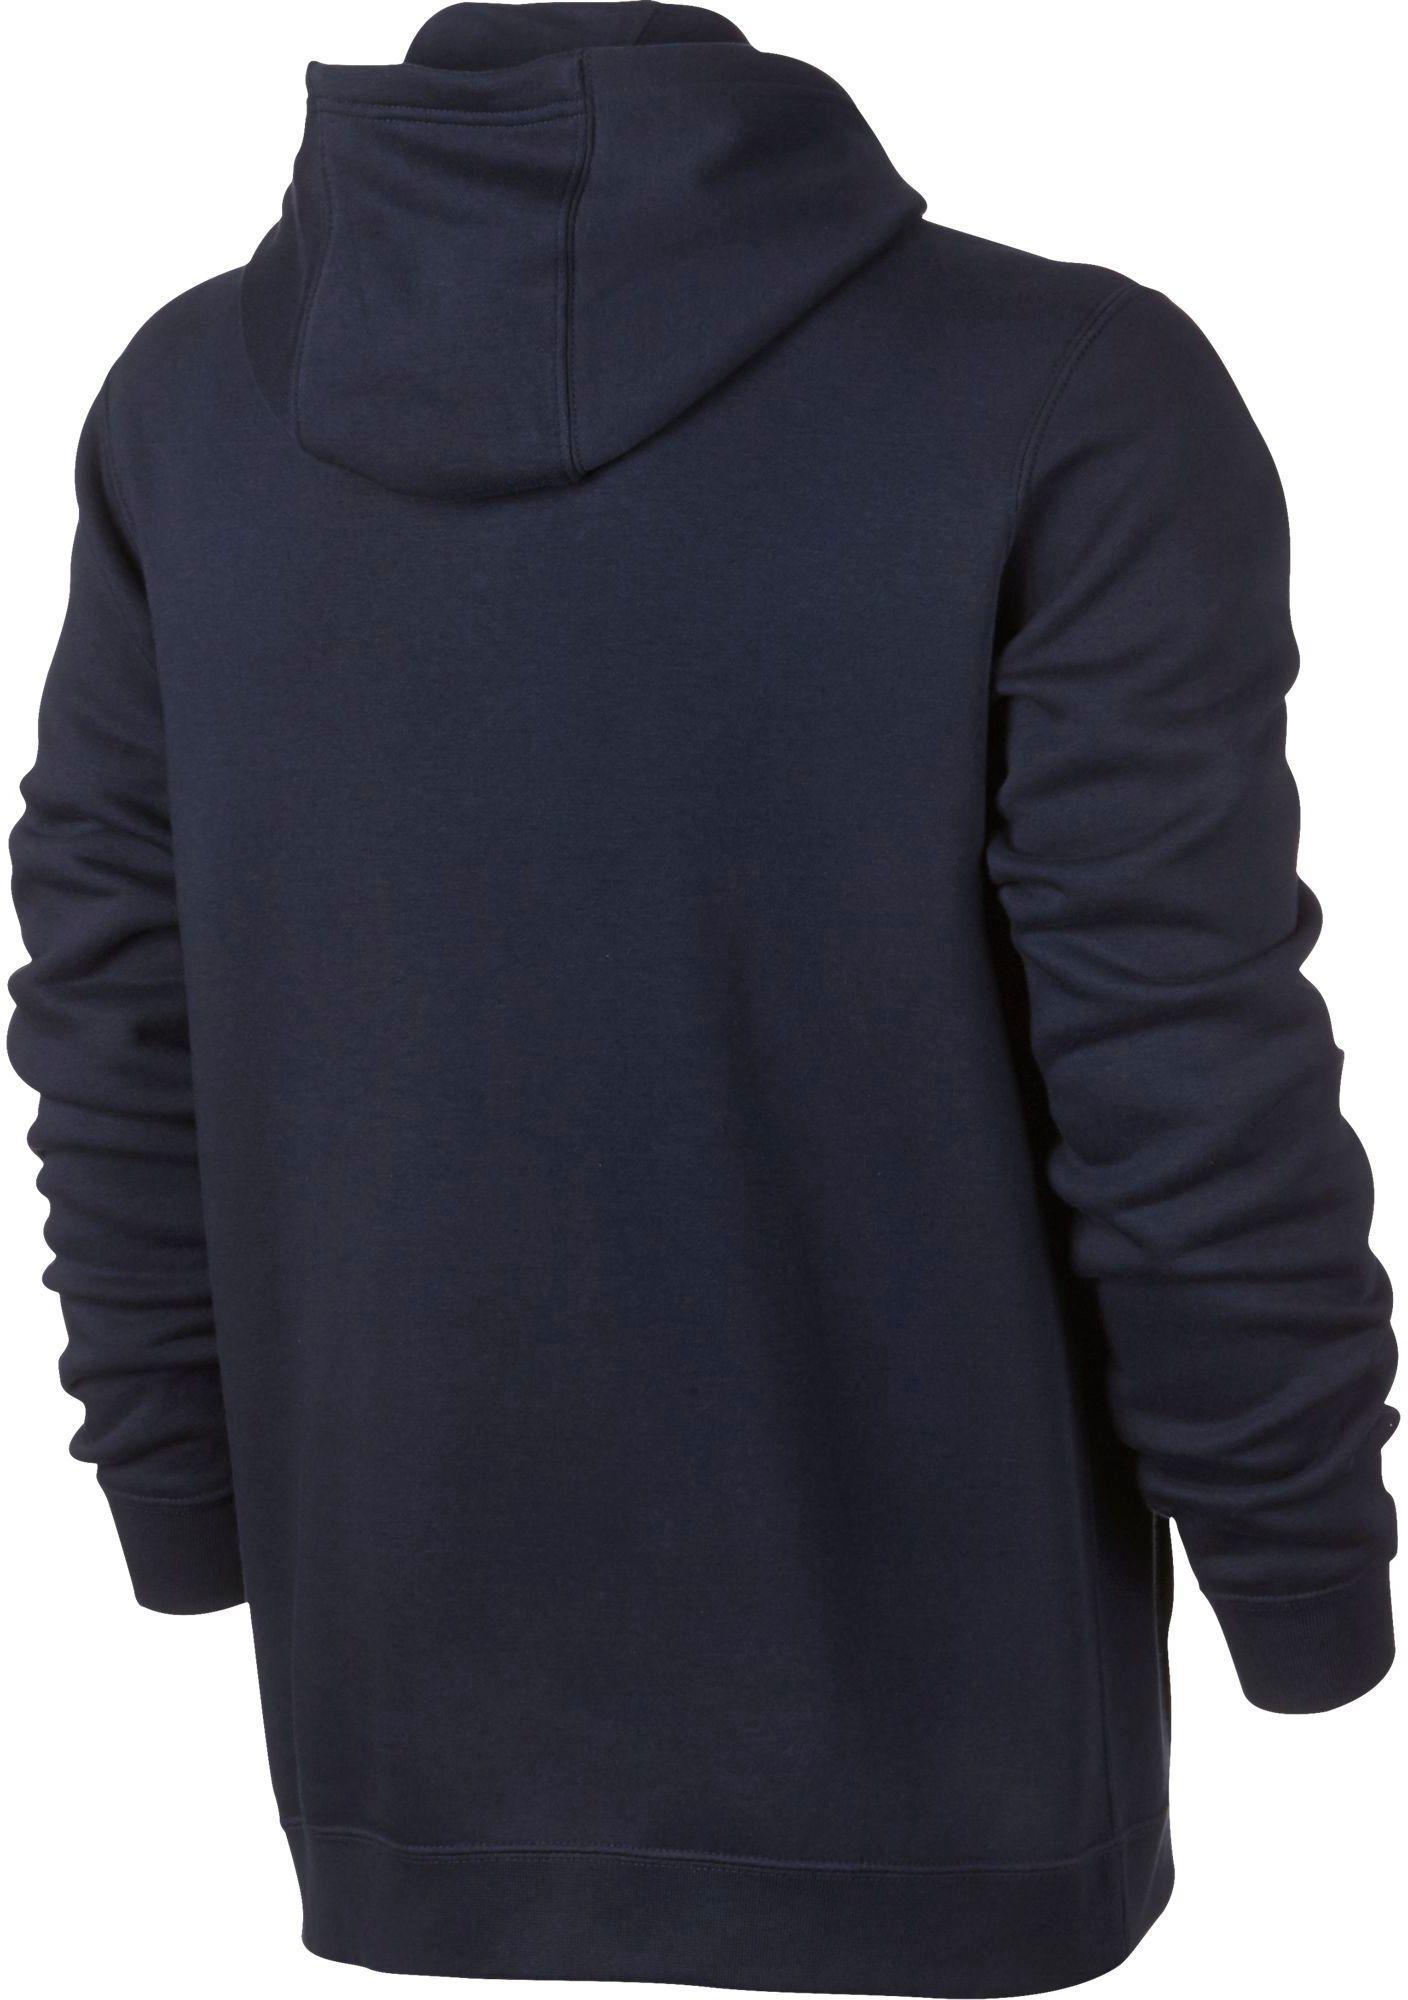 569460b2c7c3 Lyst - Nike Club Fleece Pullover Hoodie in Blue for Men